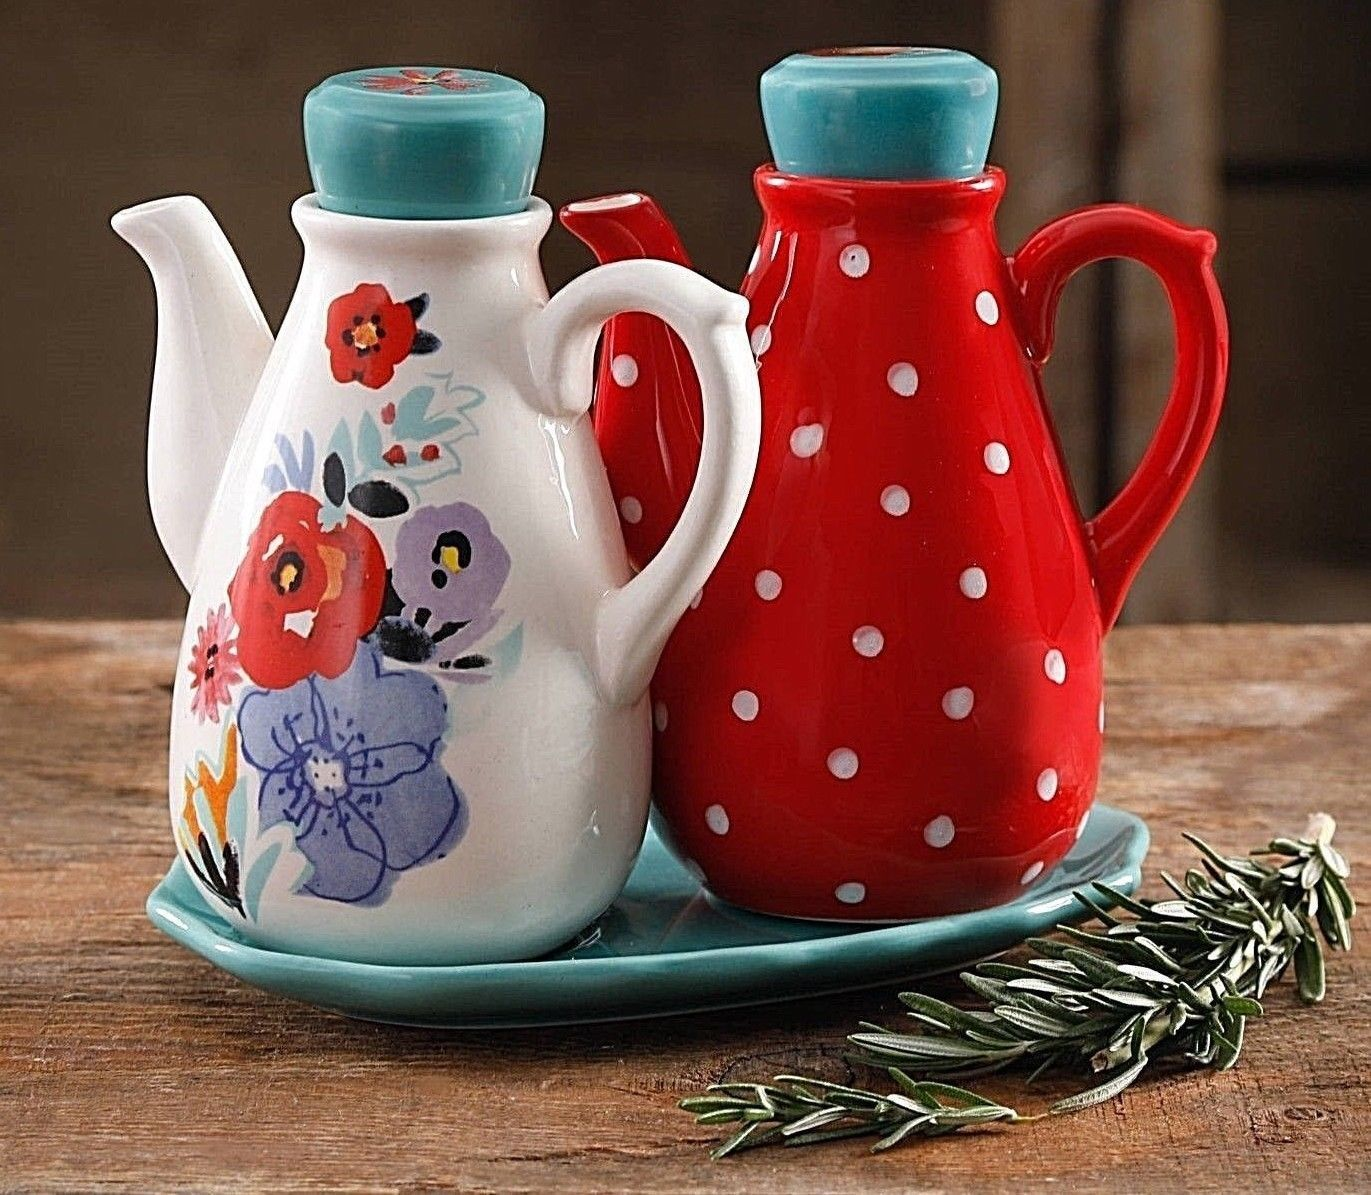 Pioneer Woman Flea Market 575 in Oil and Vinegar with Tray Set  NEW  eBayebay